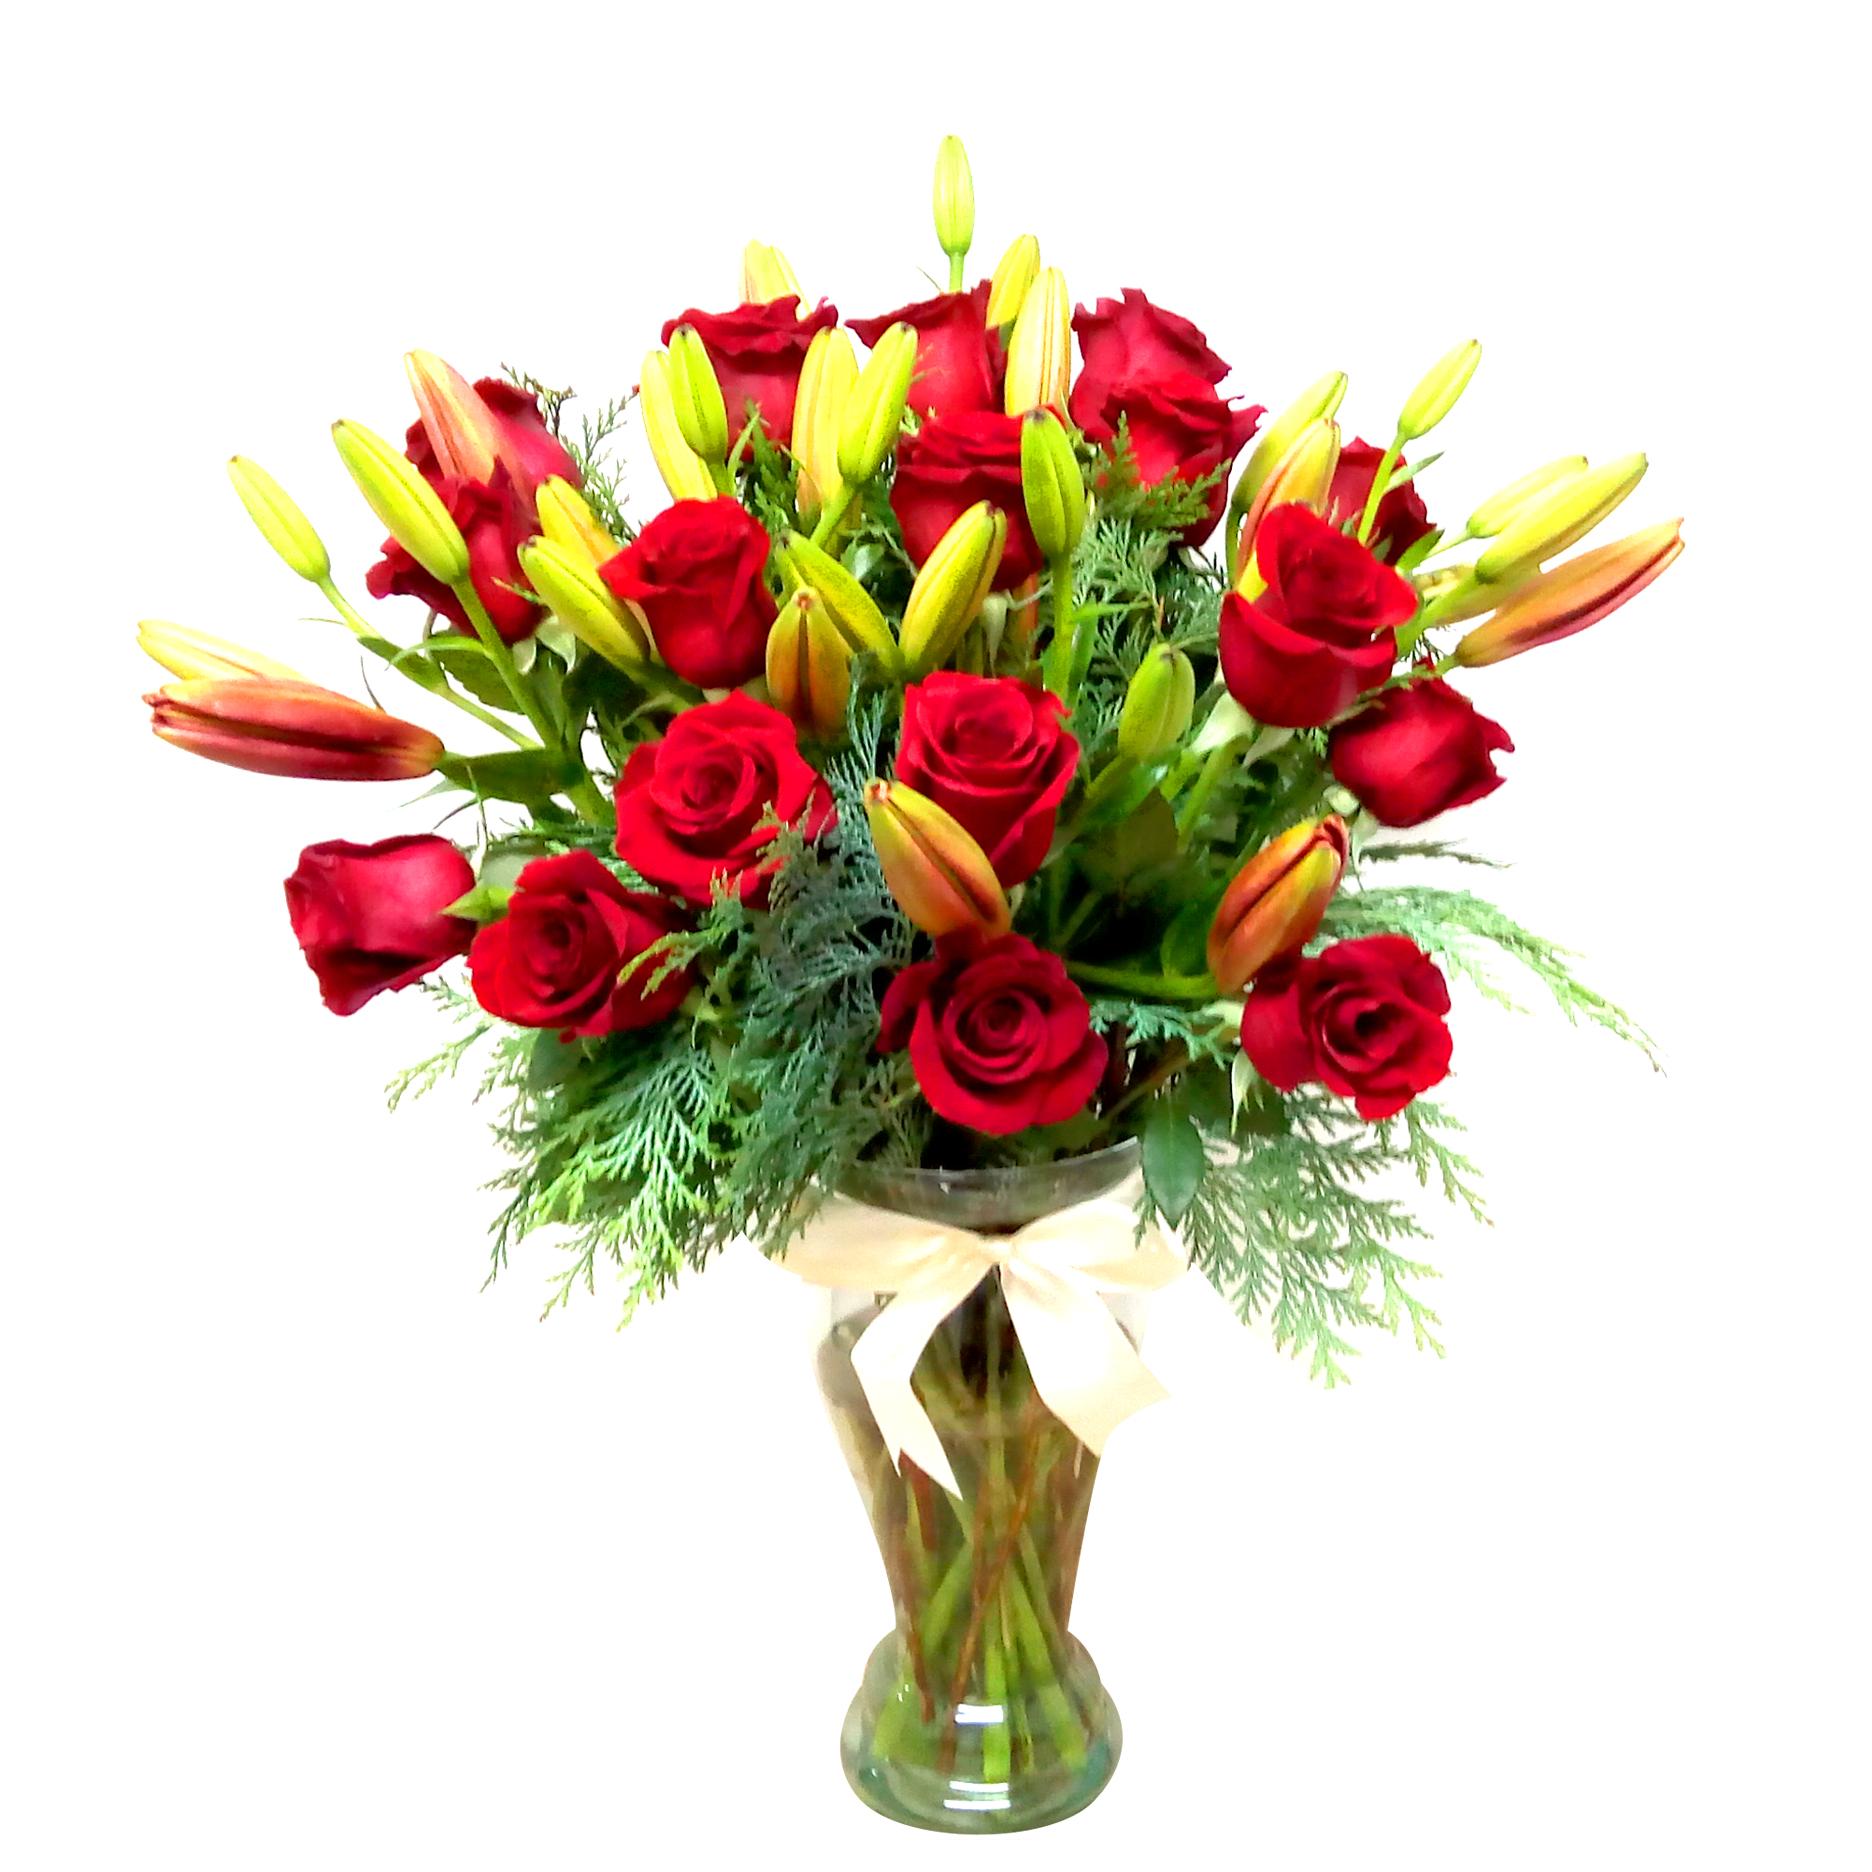 Florero con Rosas Rojas mas Lilium